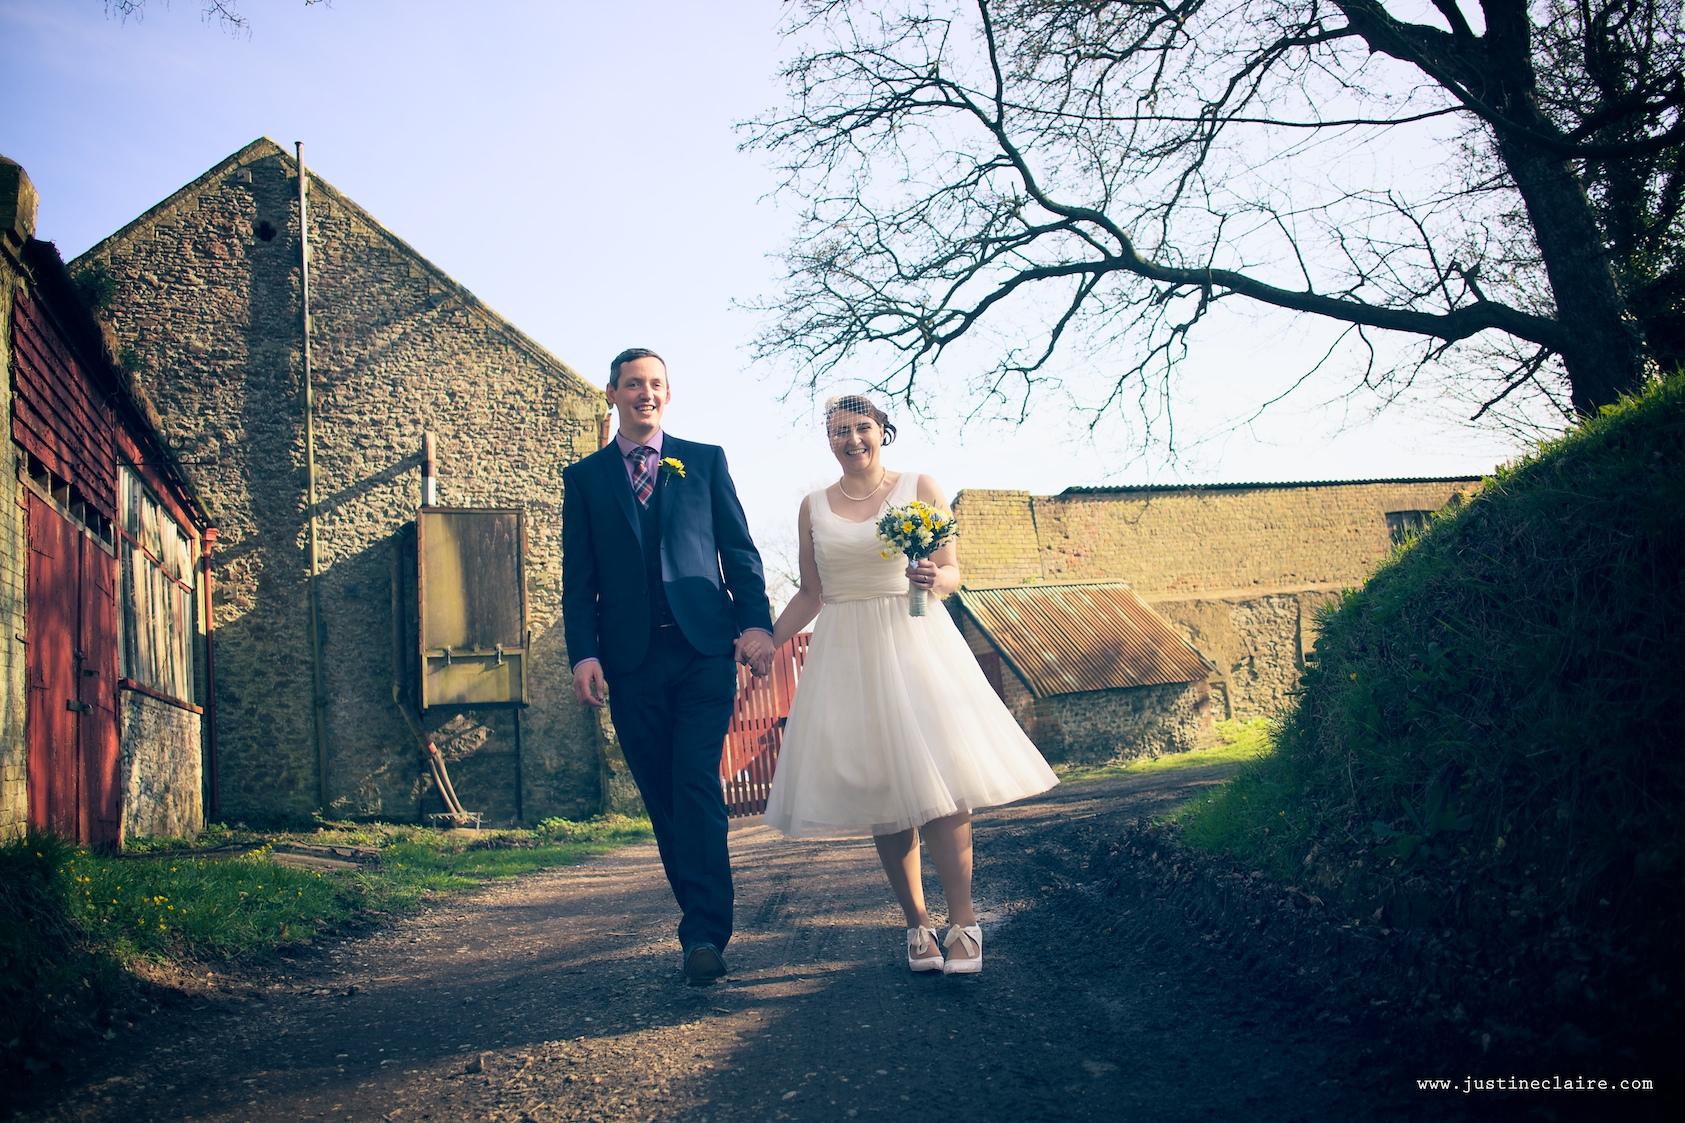 I Love my Sussex Wedding!!